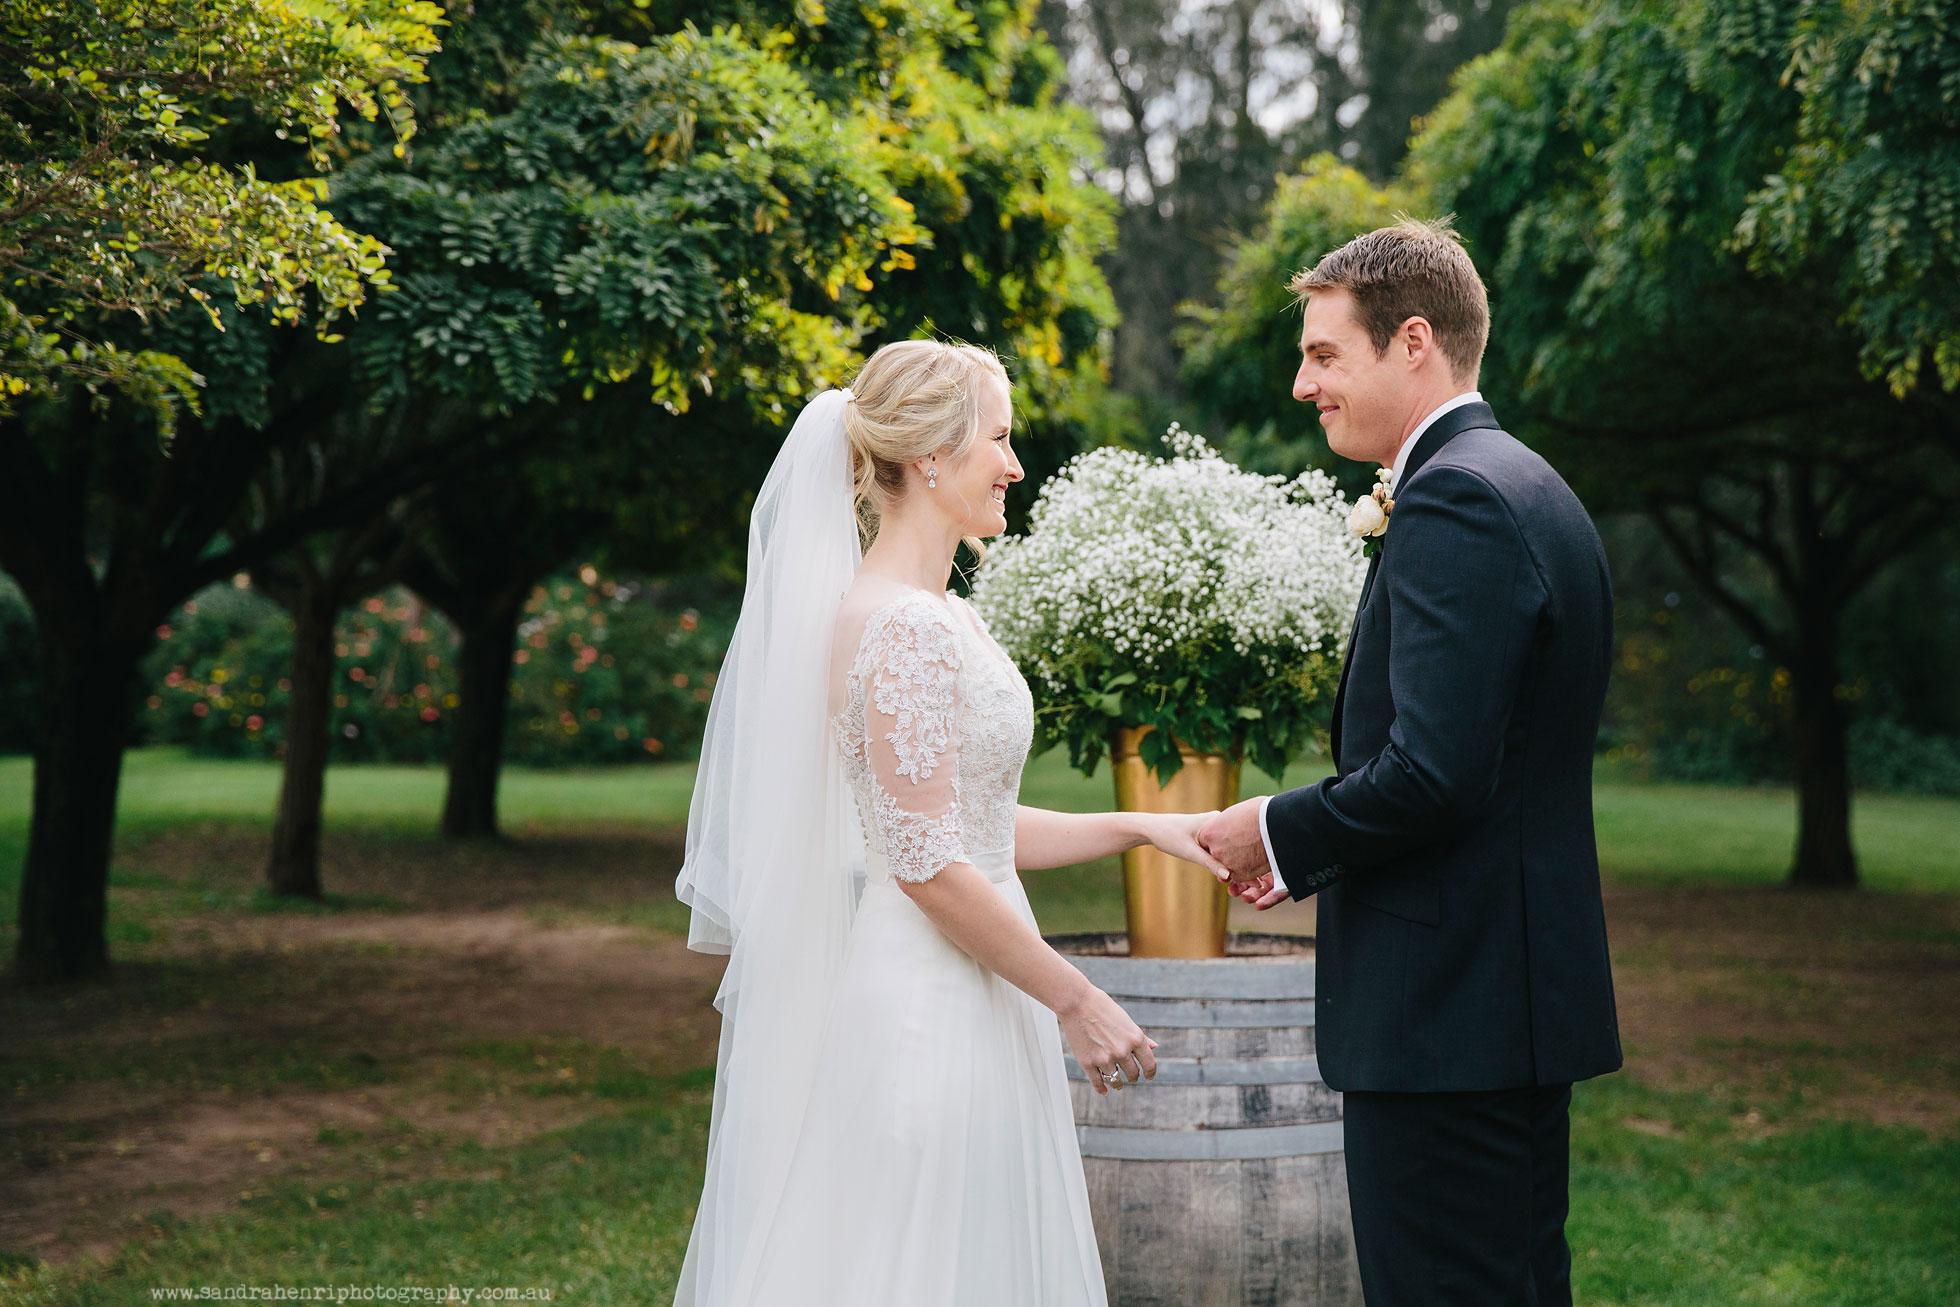 Roberts-Restaurant-garden-wedding-images-19.jpg